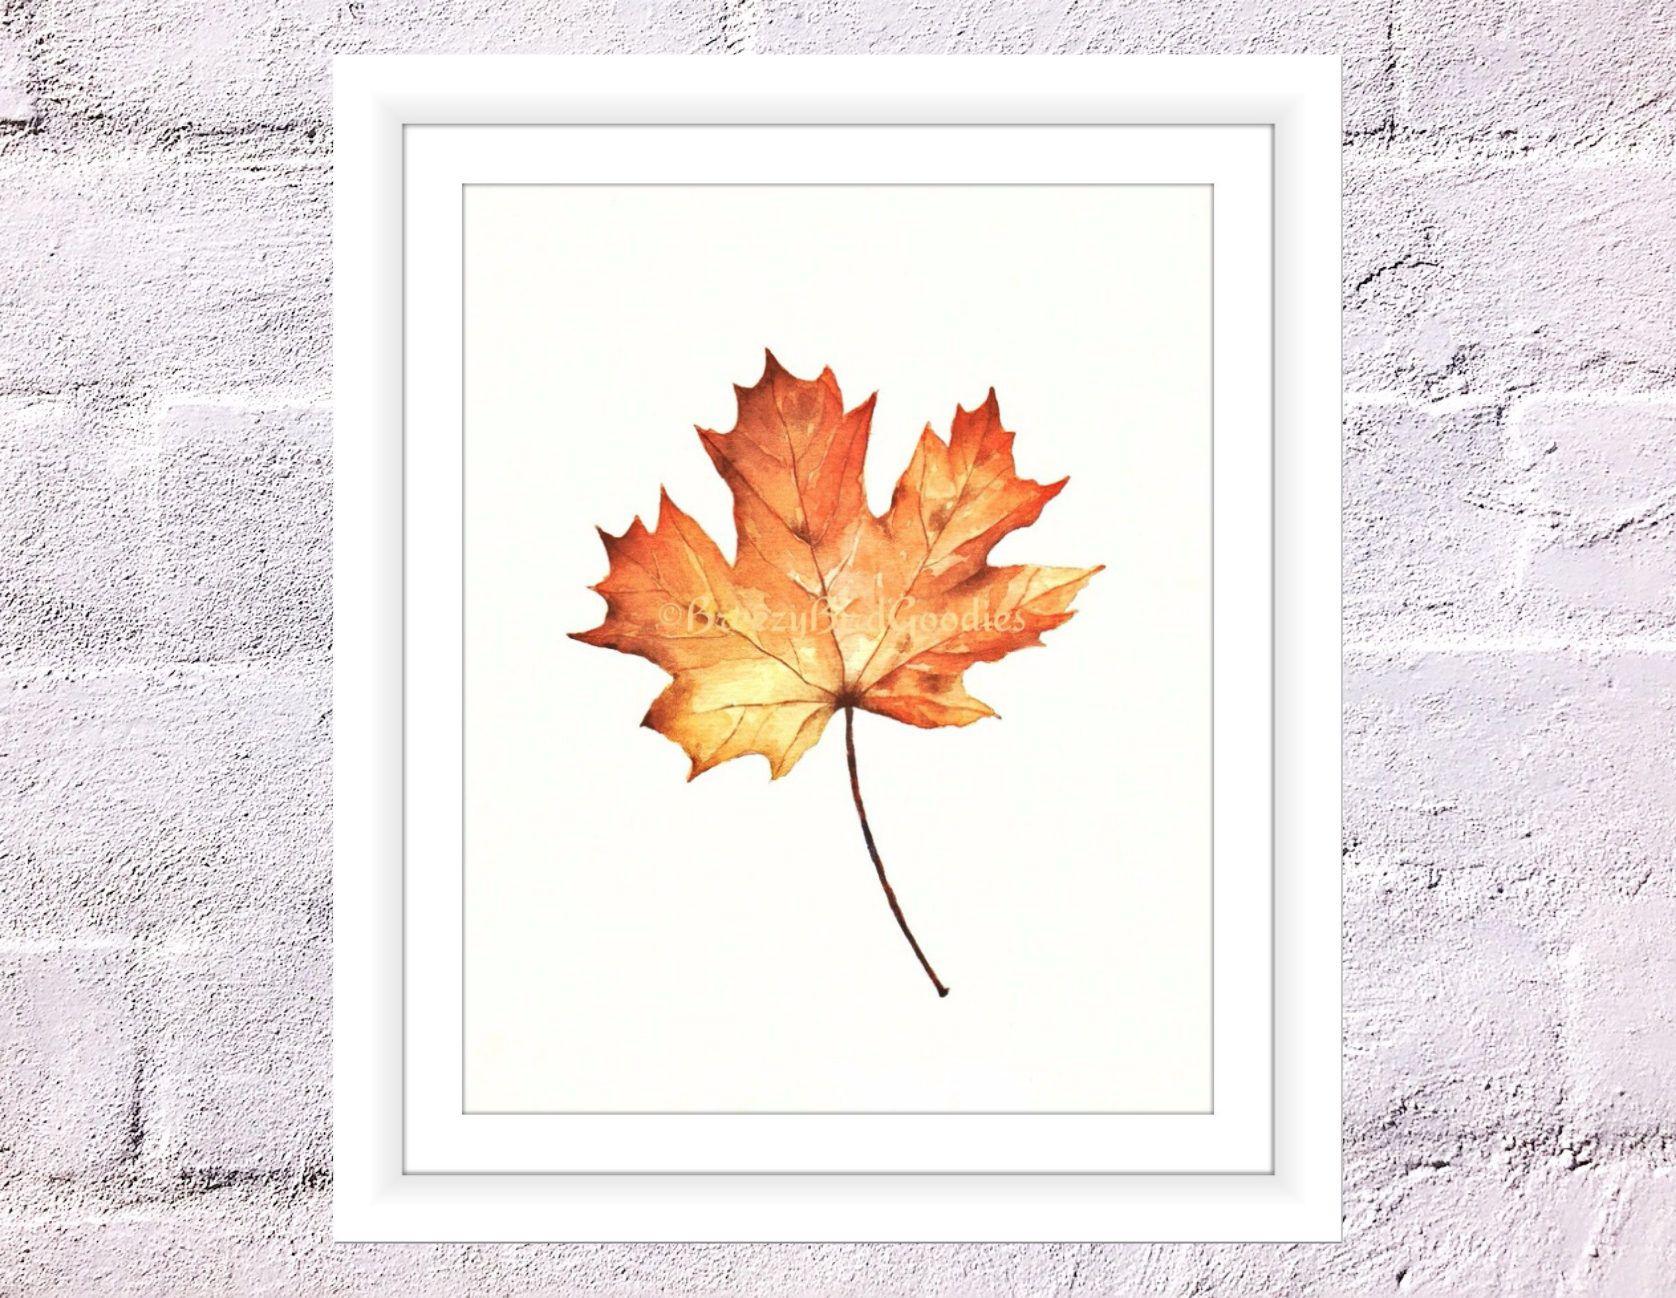 Maple Leaf Print, Autumn Leaf Print, Watercolor Maple Leaf, Watercolour